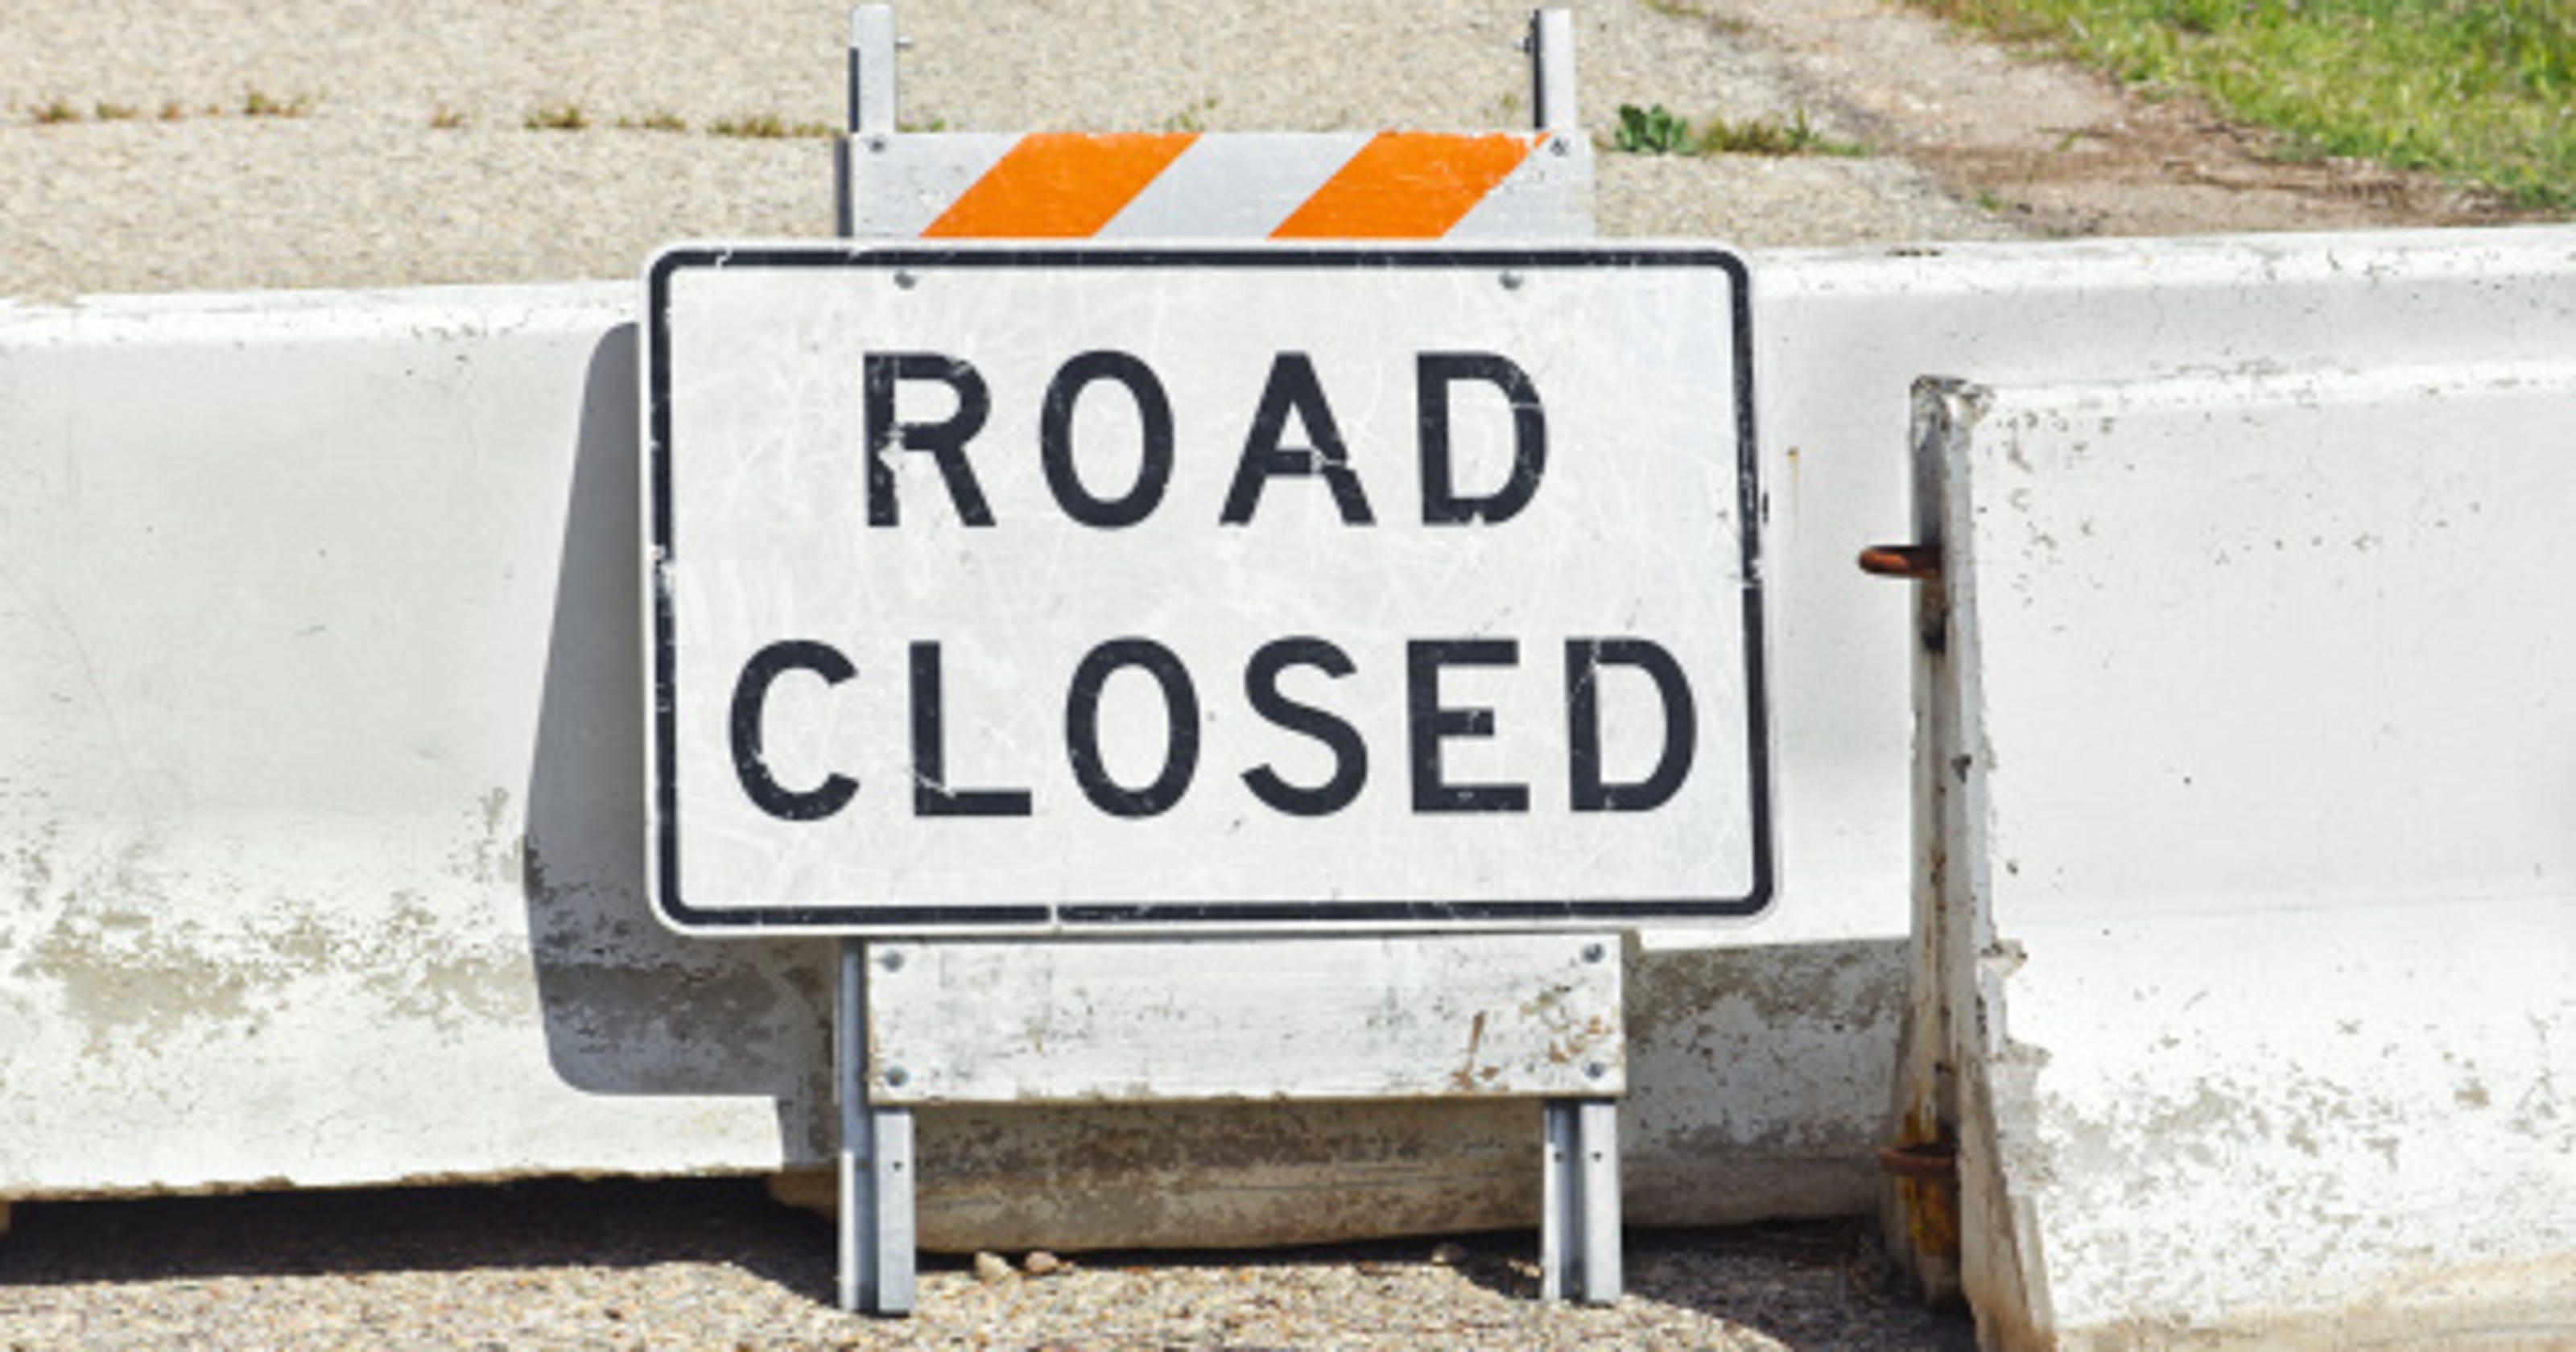 I-76 Mount Ephraim, Gloucester City ramps close tonight